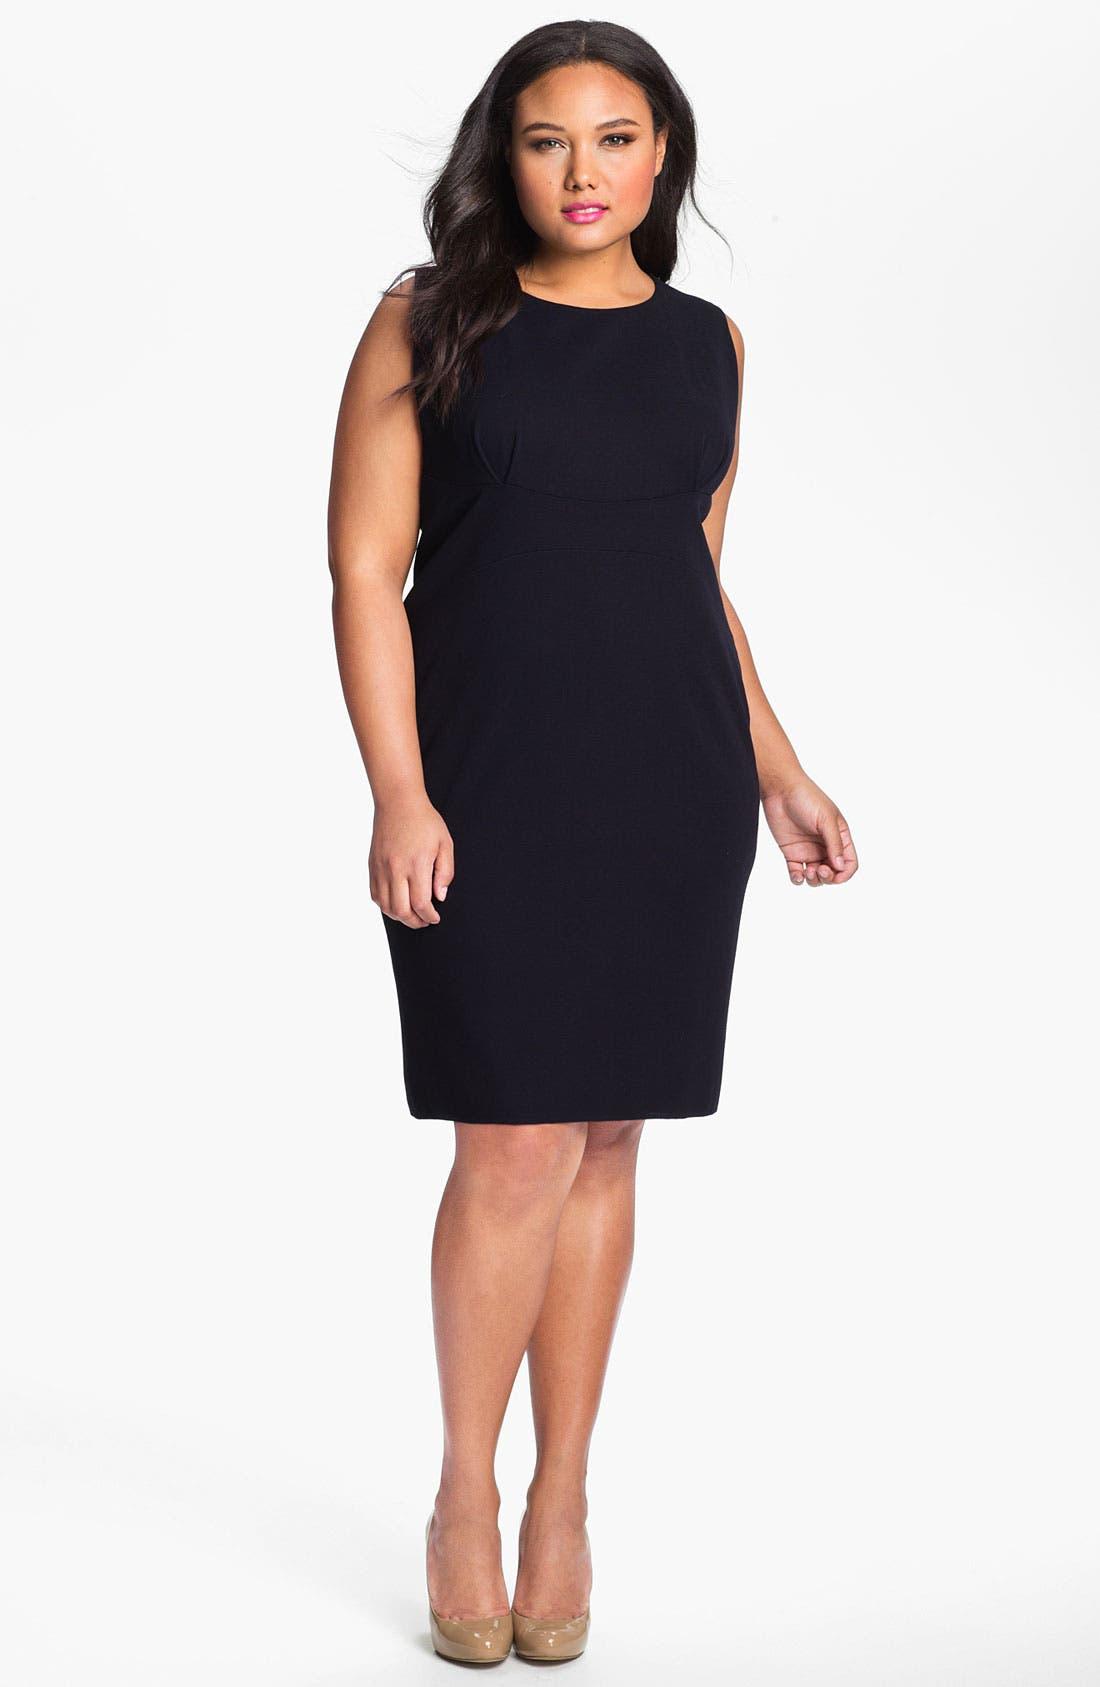 Main Image - Exclusively Misook 'Alex' Tailored Sheath Dress (Plus)